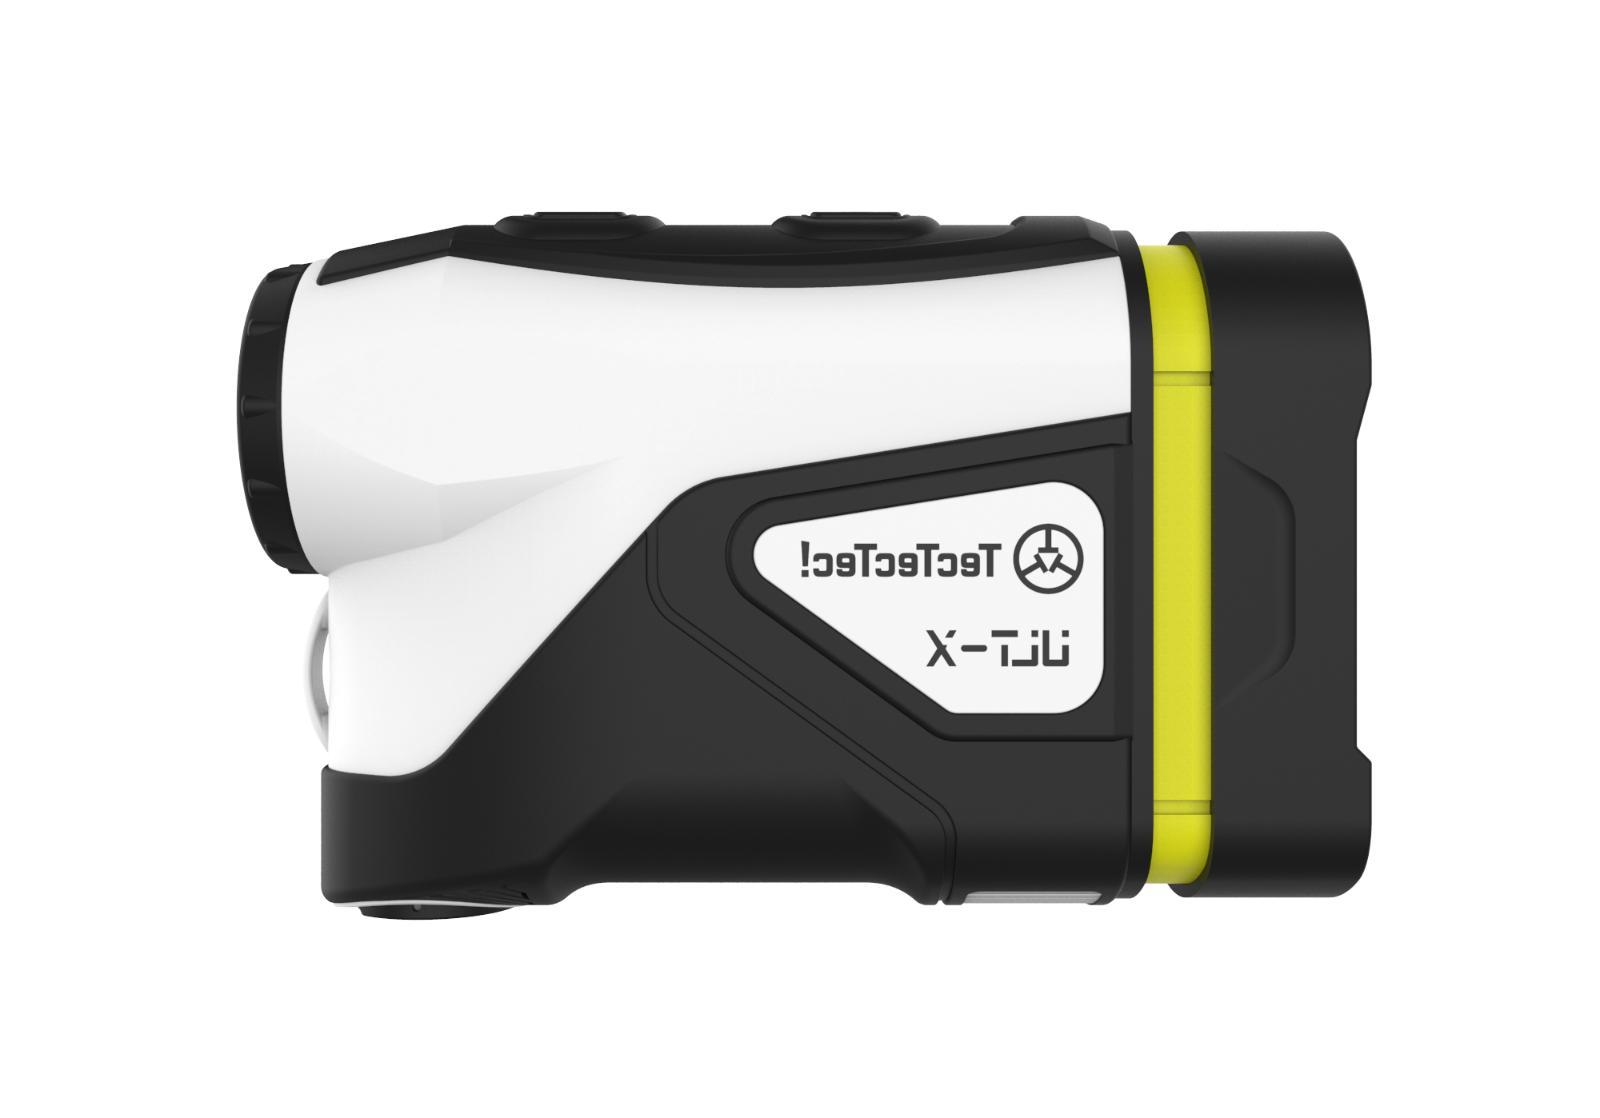 TecTecTec Golf - Laser with 1,000 Yard